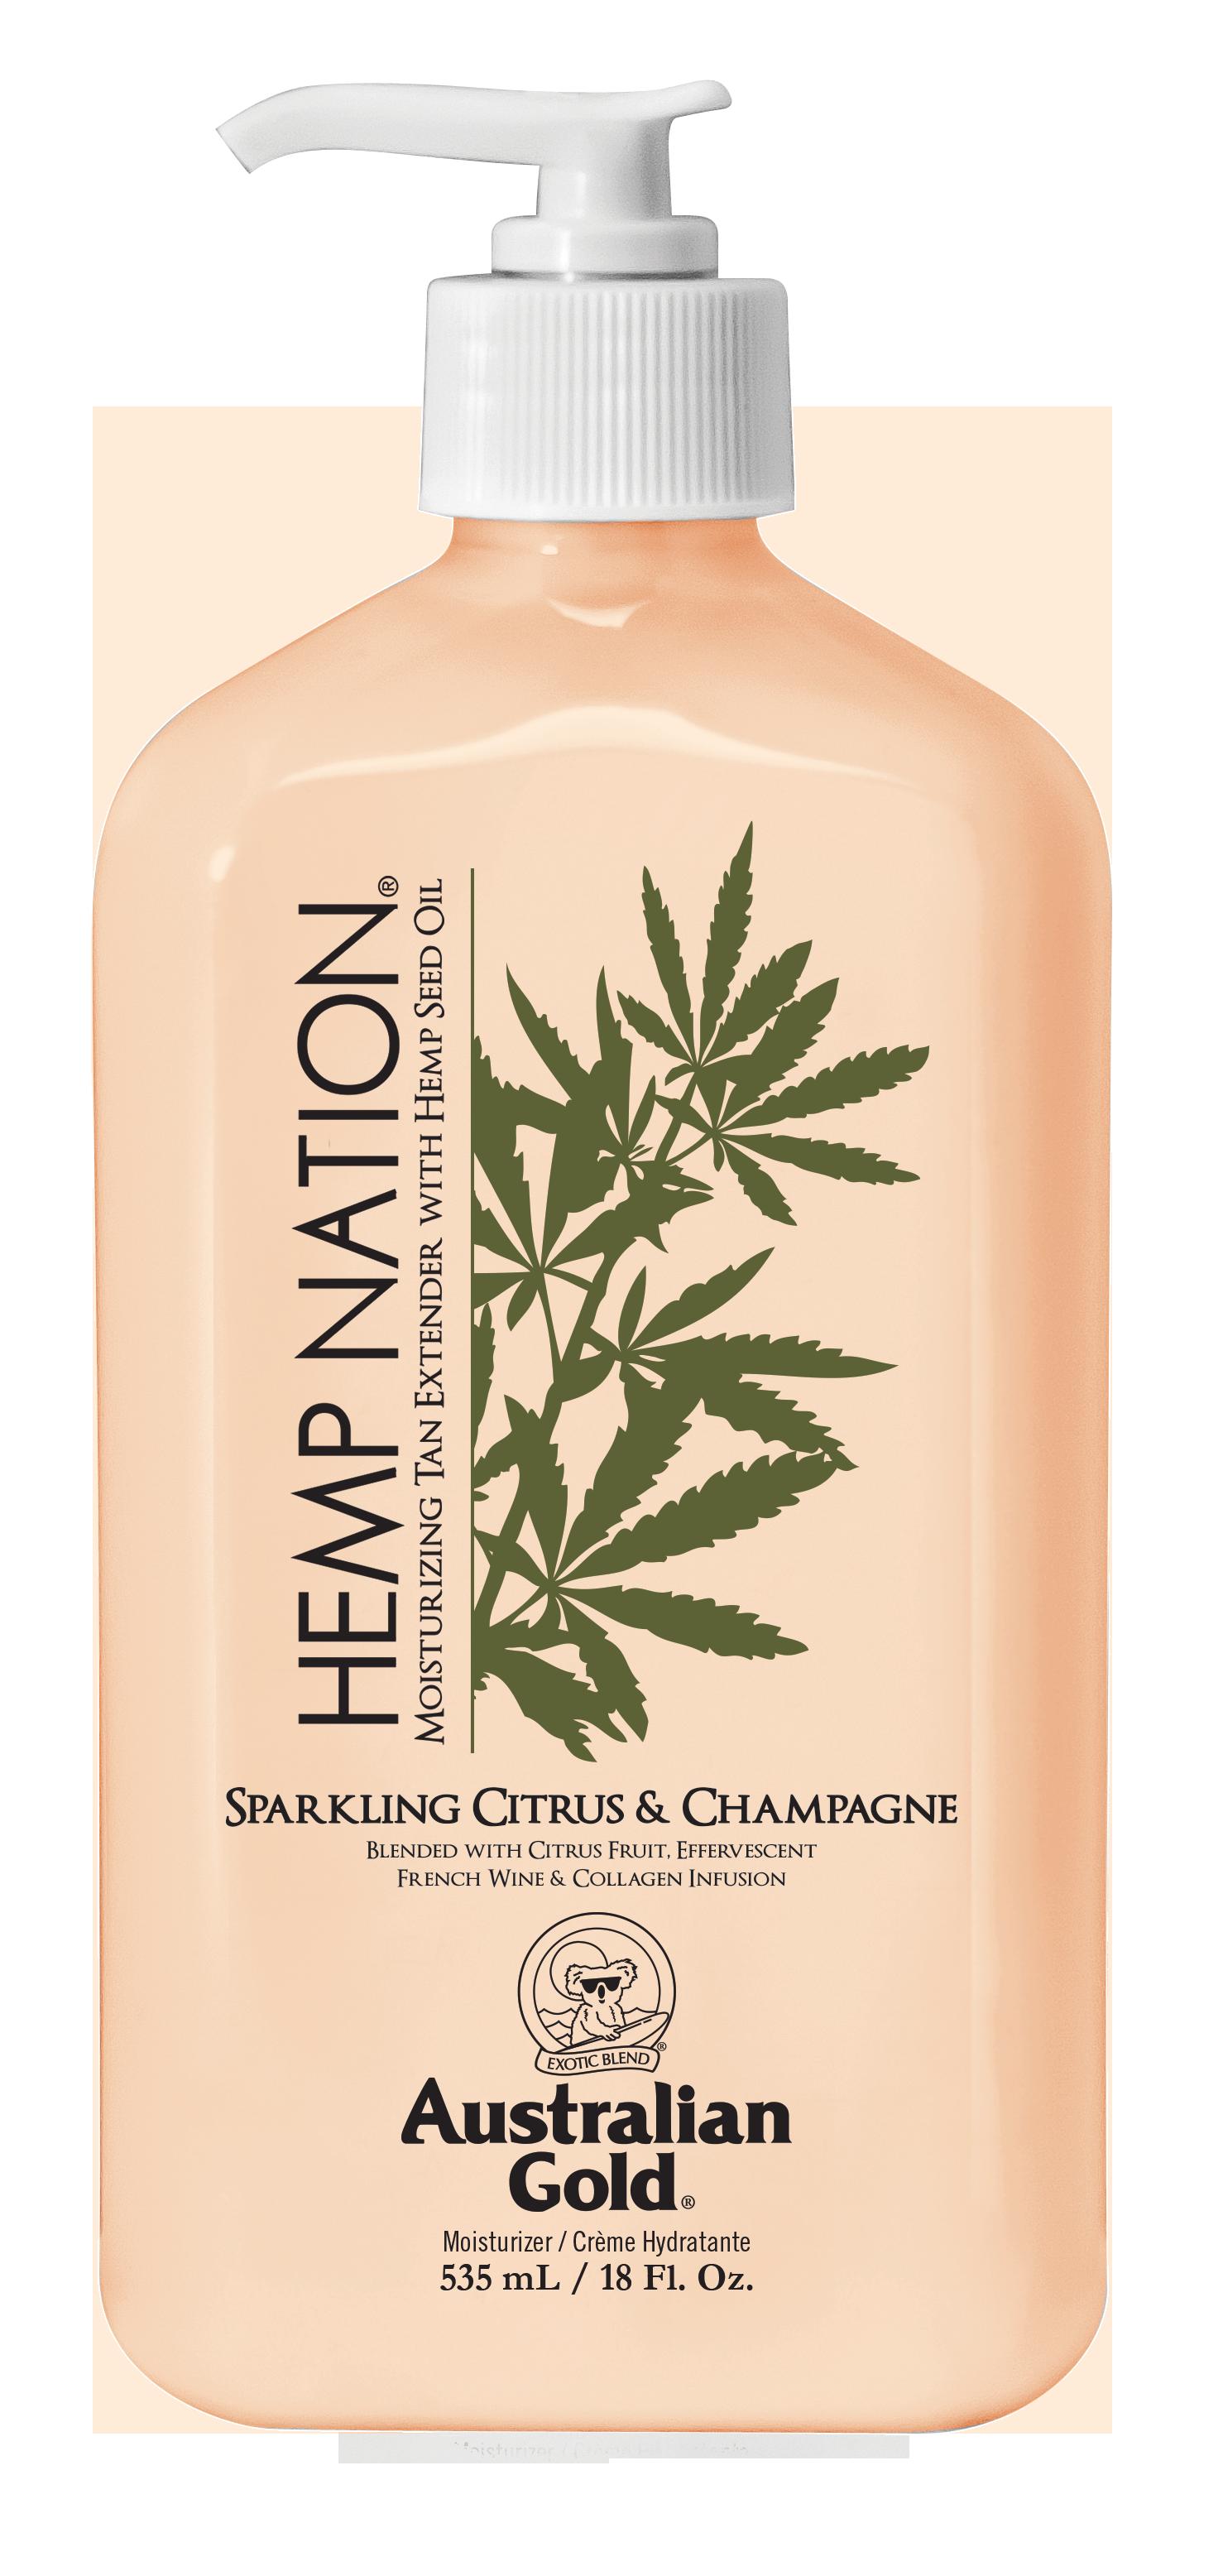 Australian Gold - Hemp Nation Sparkling Citrus & Champagne Tan Extender Body Lotion 535 ml